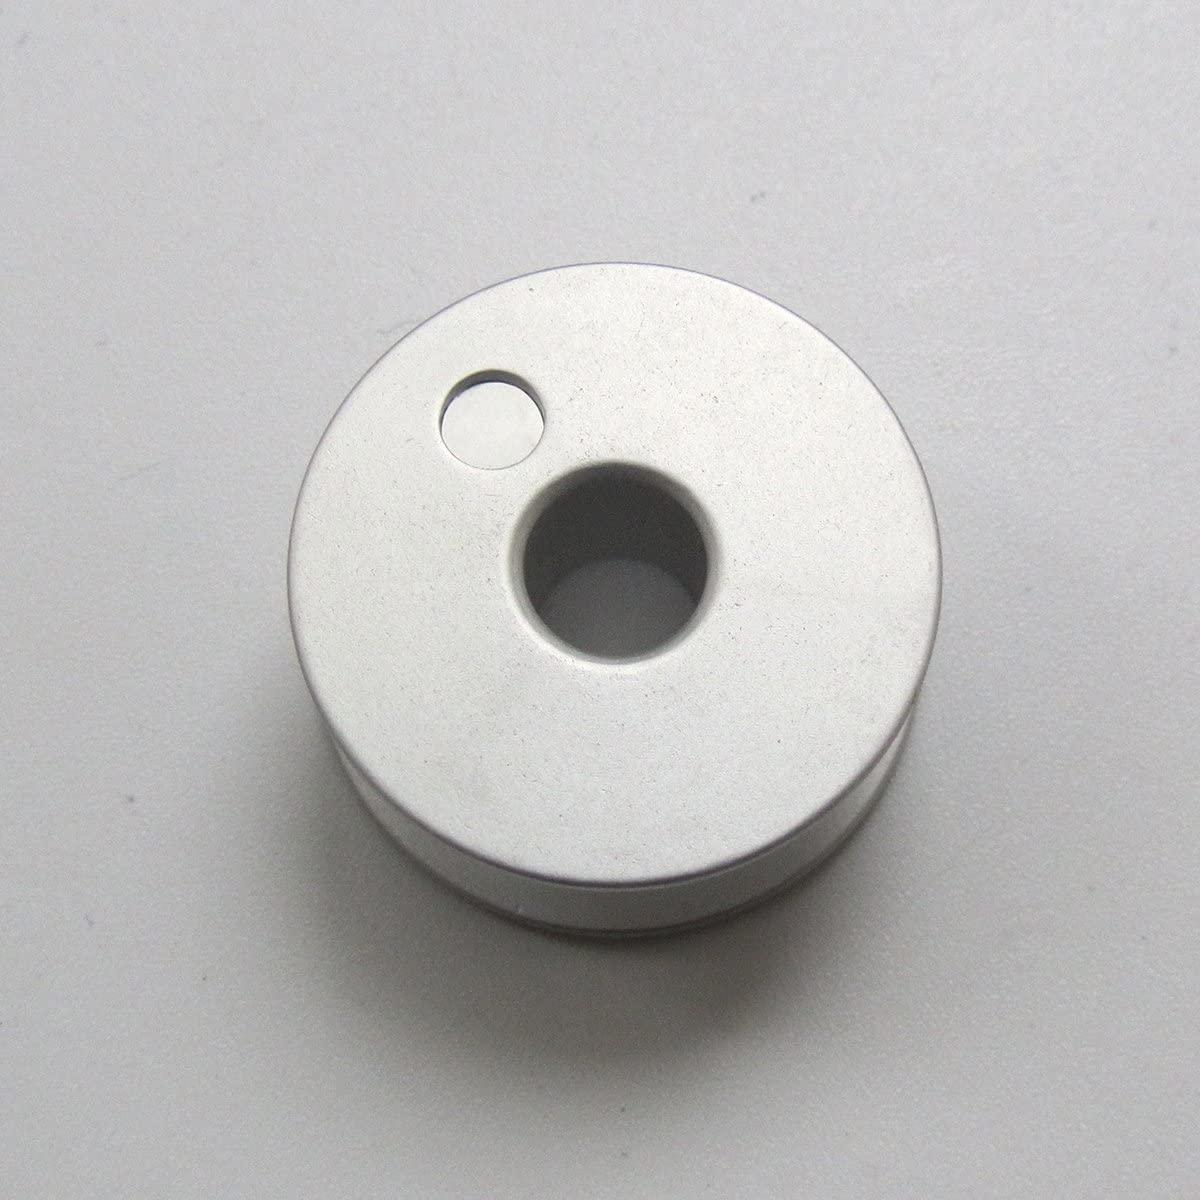 KUNPENG - for CONSEW 225/226&Singer 111G 111W 211G 211U 211W Aluminum BOBBINS #244750 (50)